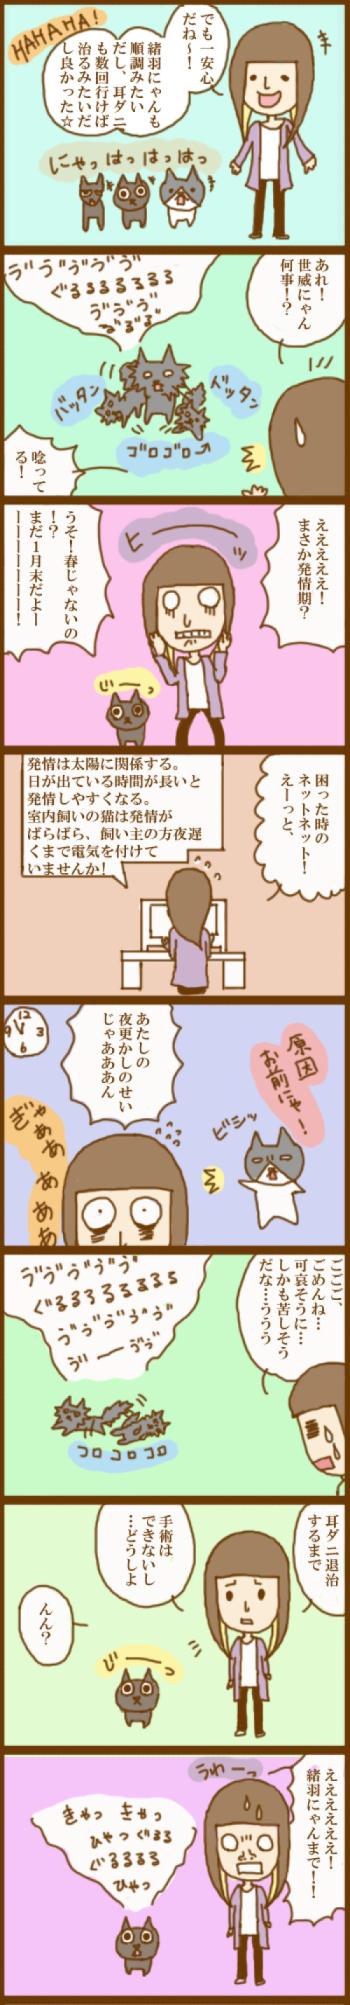 f:id:suzuokayu:20201115185844j:plain